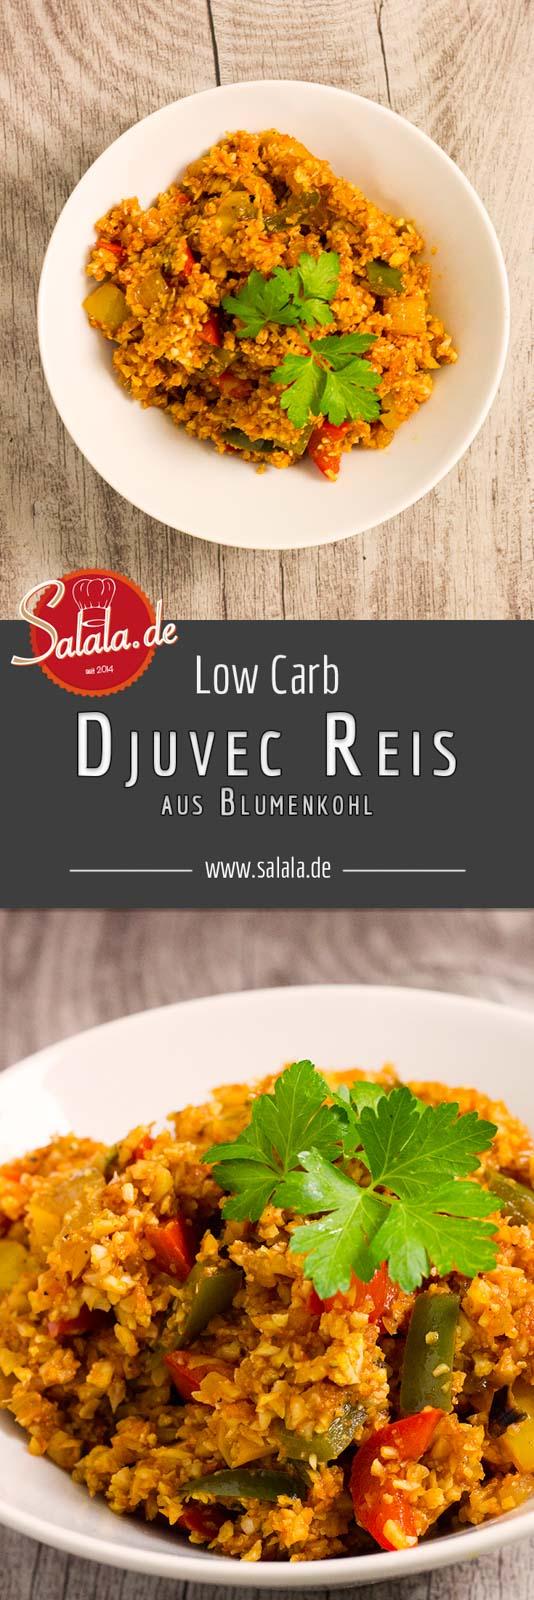 Djuvec Reis Low Carb aus Blumenkohlreis vegetarisch - salala.de - Djuvec Reis Low Carb mit Blumenkohlreis -